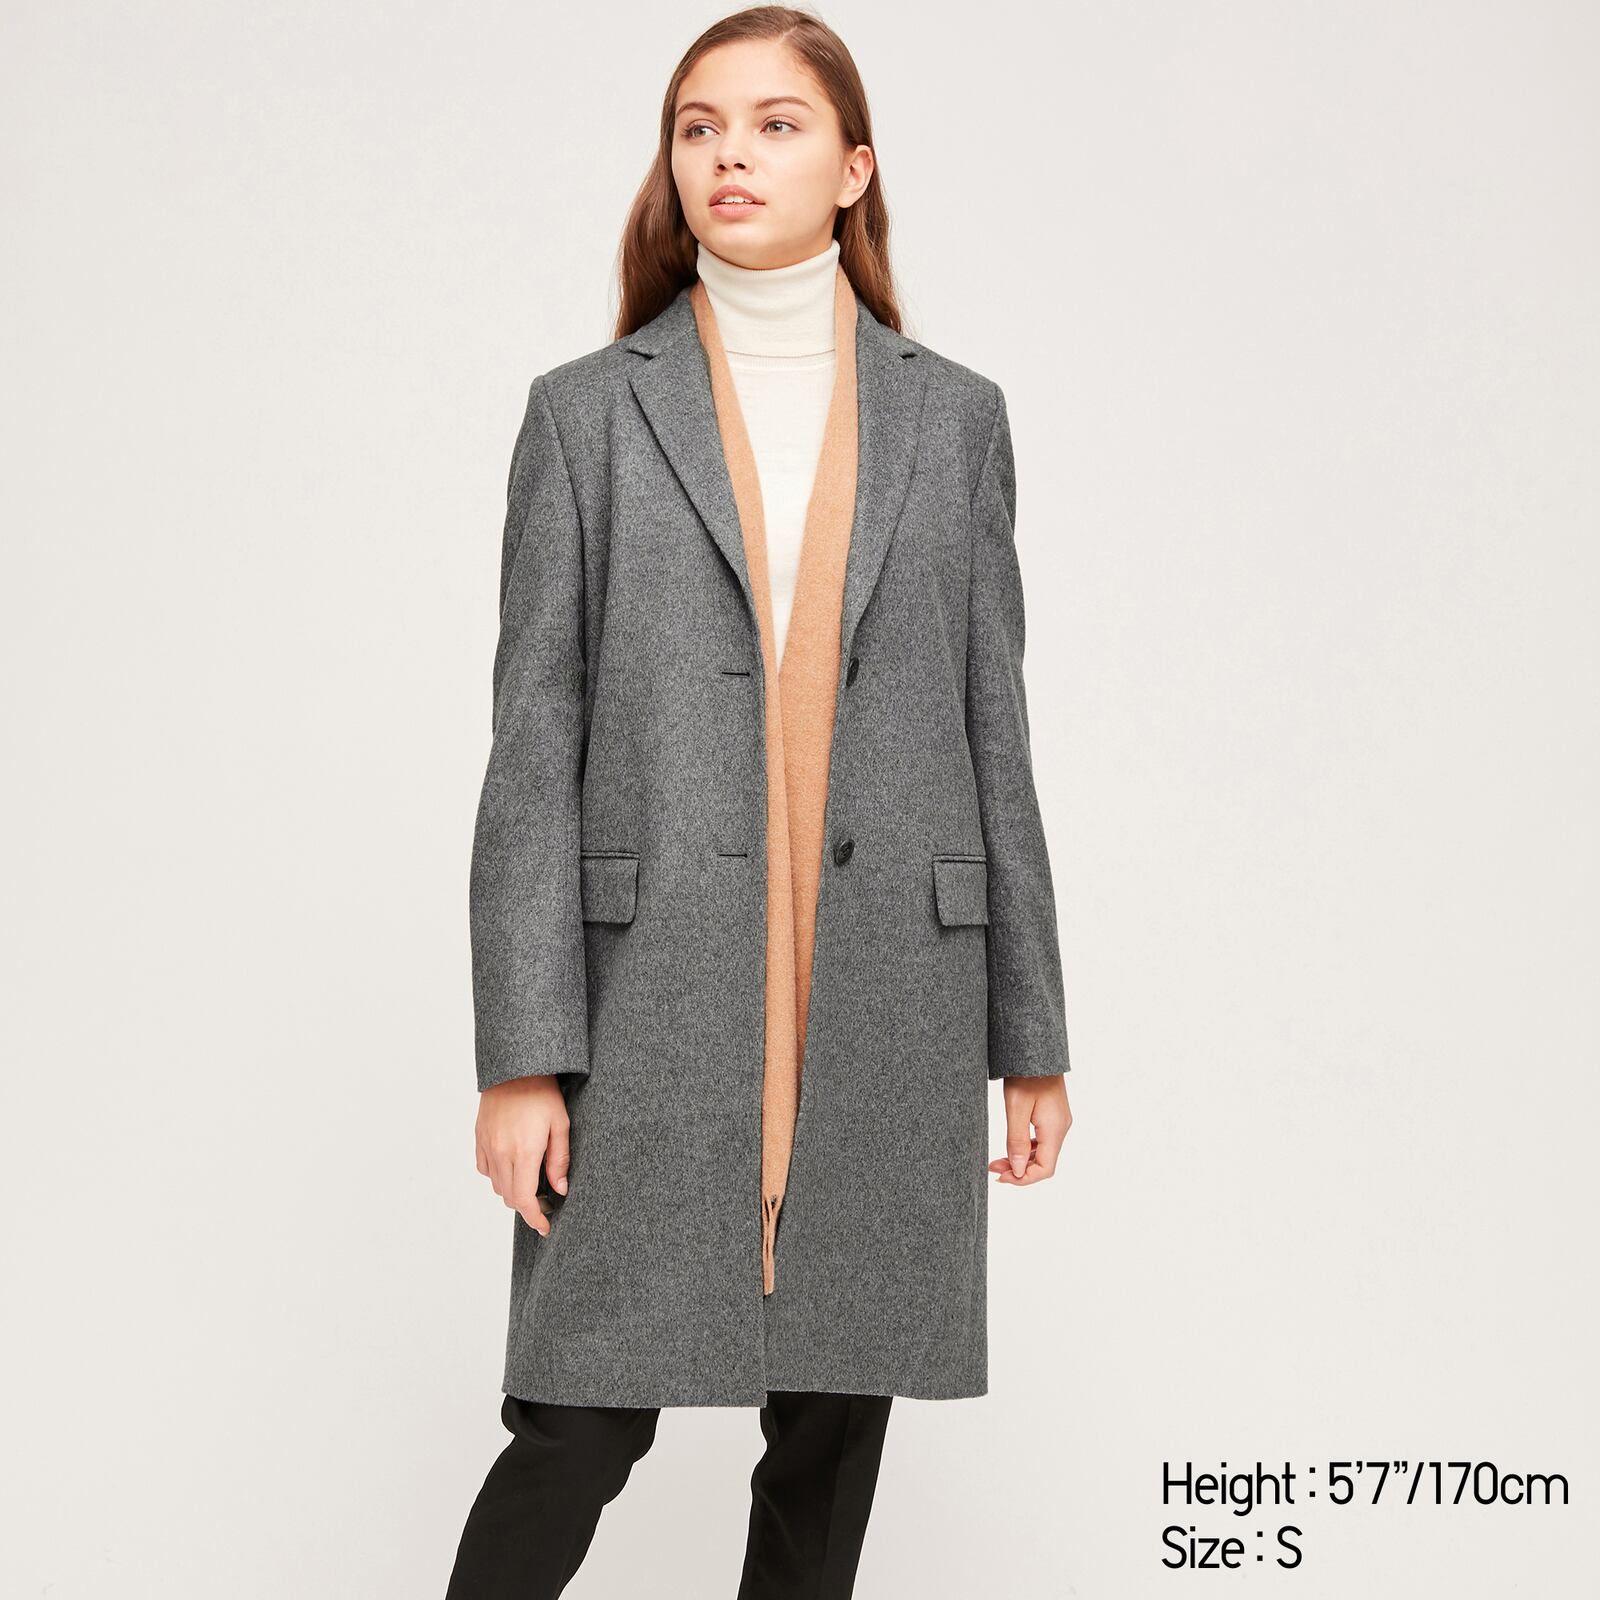 Uniqlo Cashmere Blend Chester Coat Coats For Women Coat Coats Jackets Women [ 1600 x 1600 Pixel ]